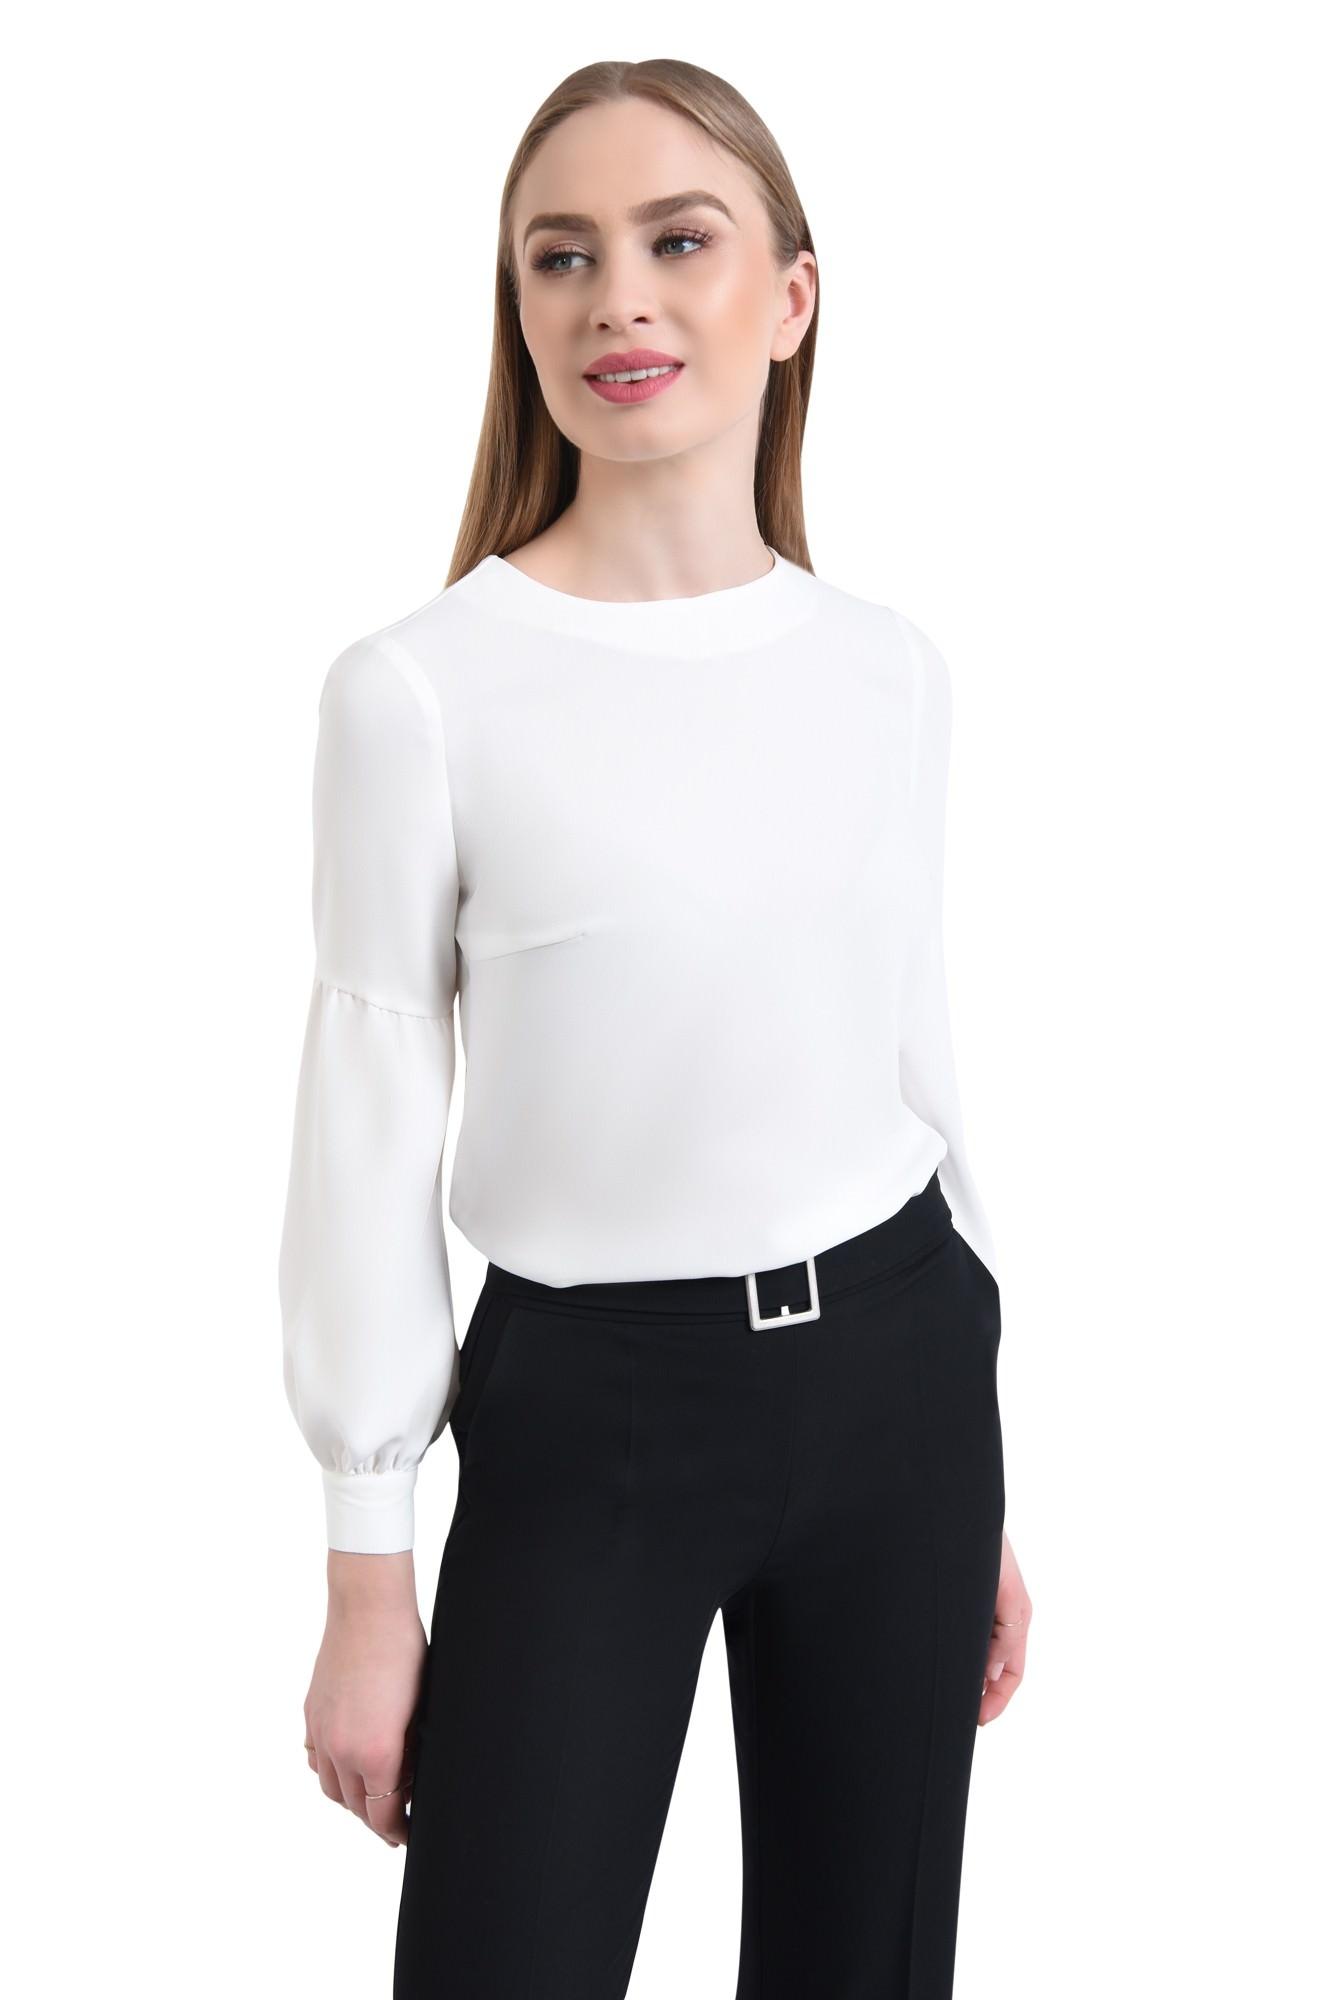 0 - Bluza casual, alb, maneci bufante